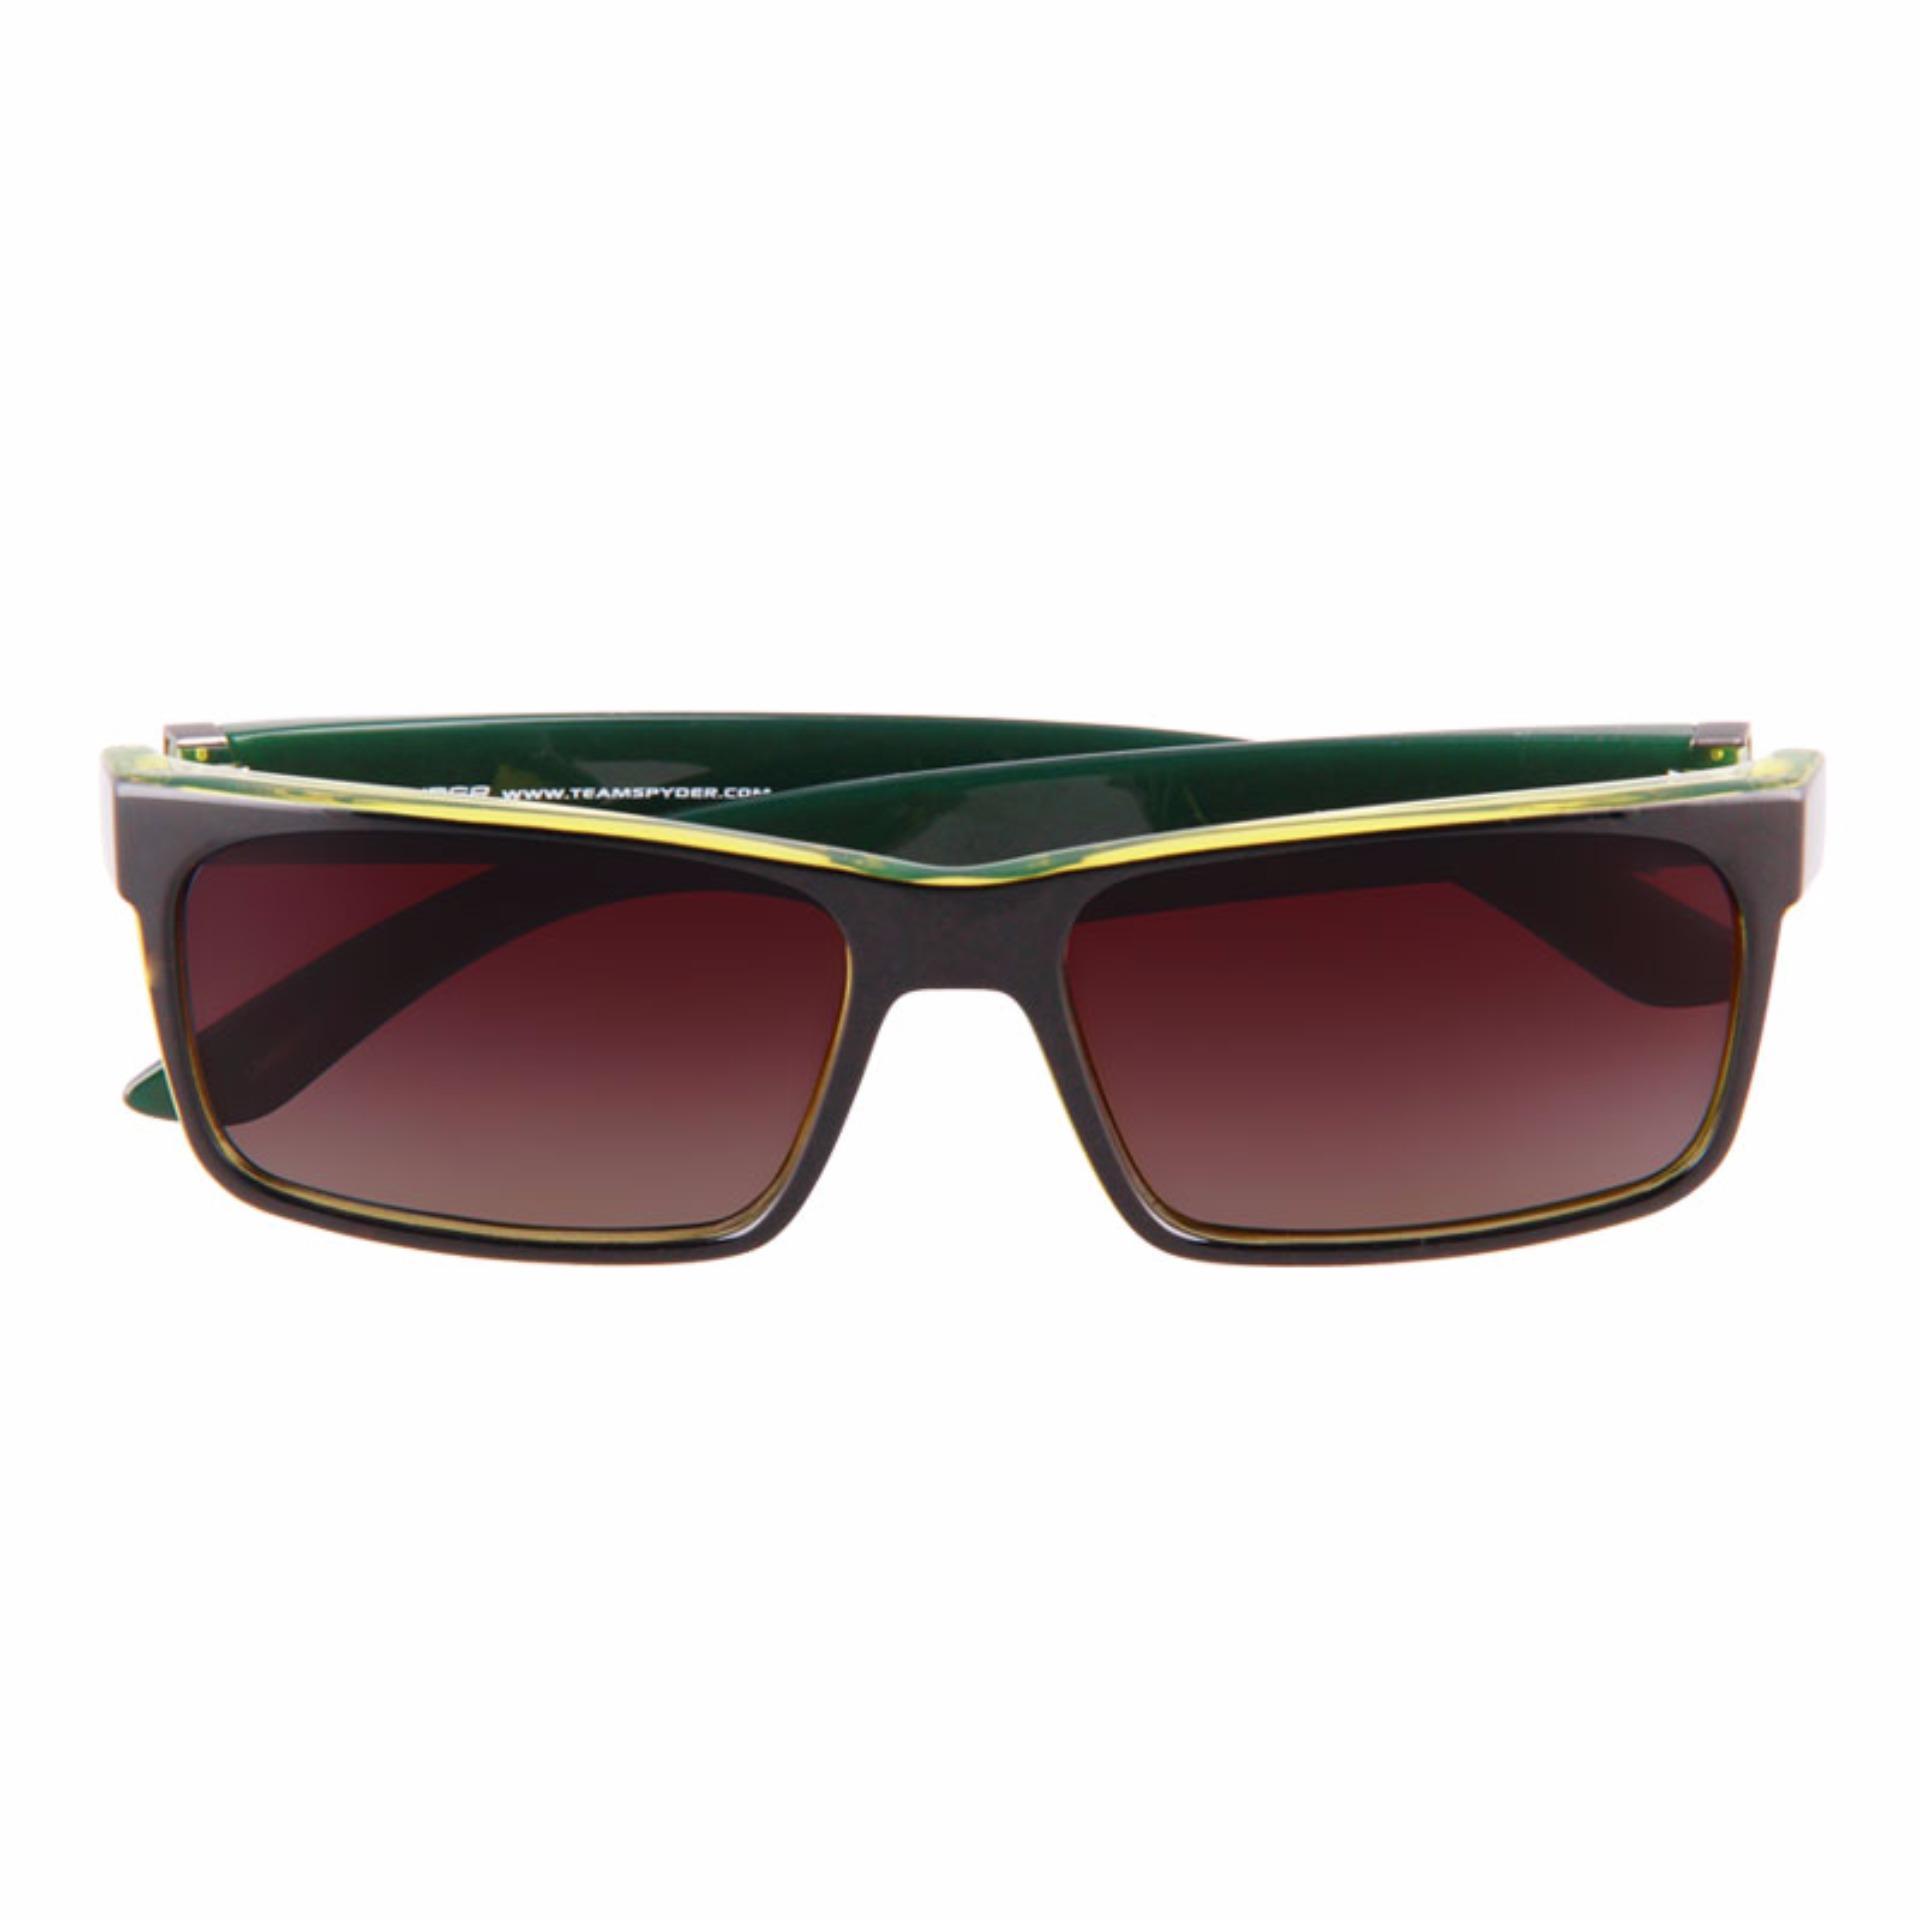 Nixon Sunglasses  spyder lifestyle eyewear nixon 3 9s010 pz shiny black frame smoke